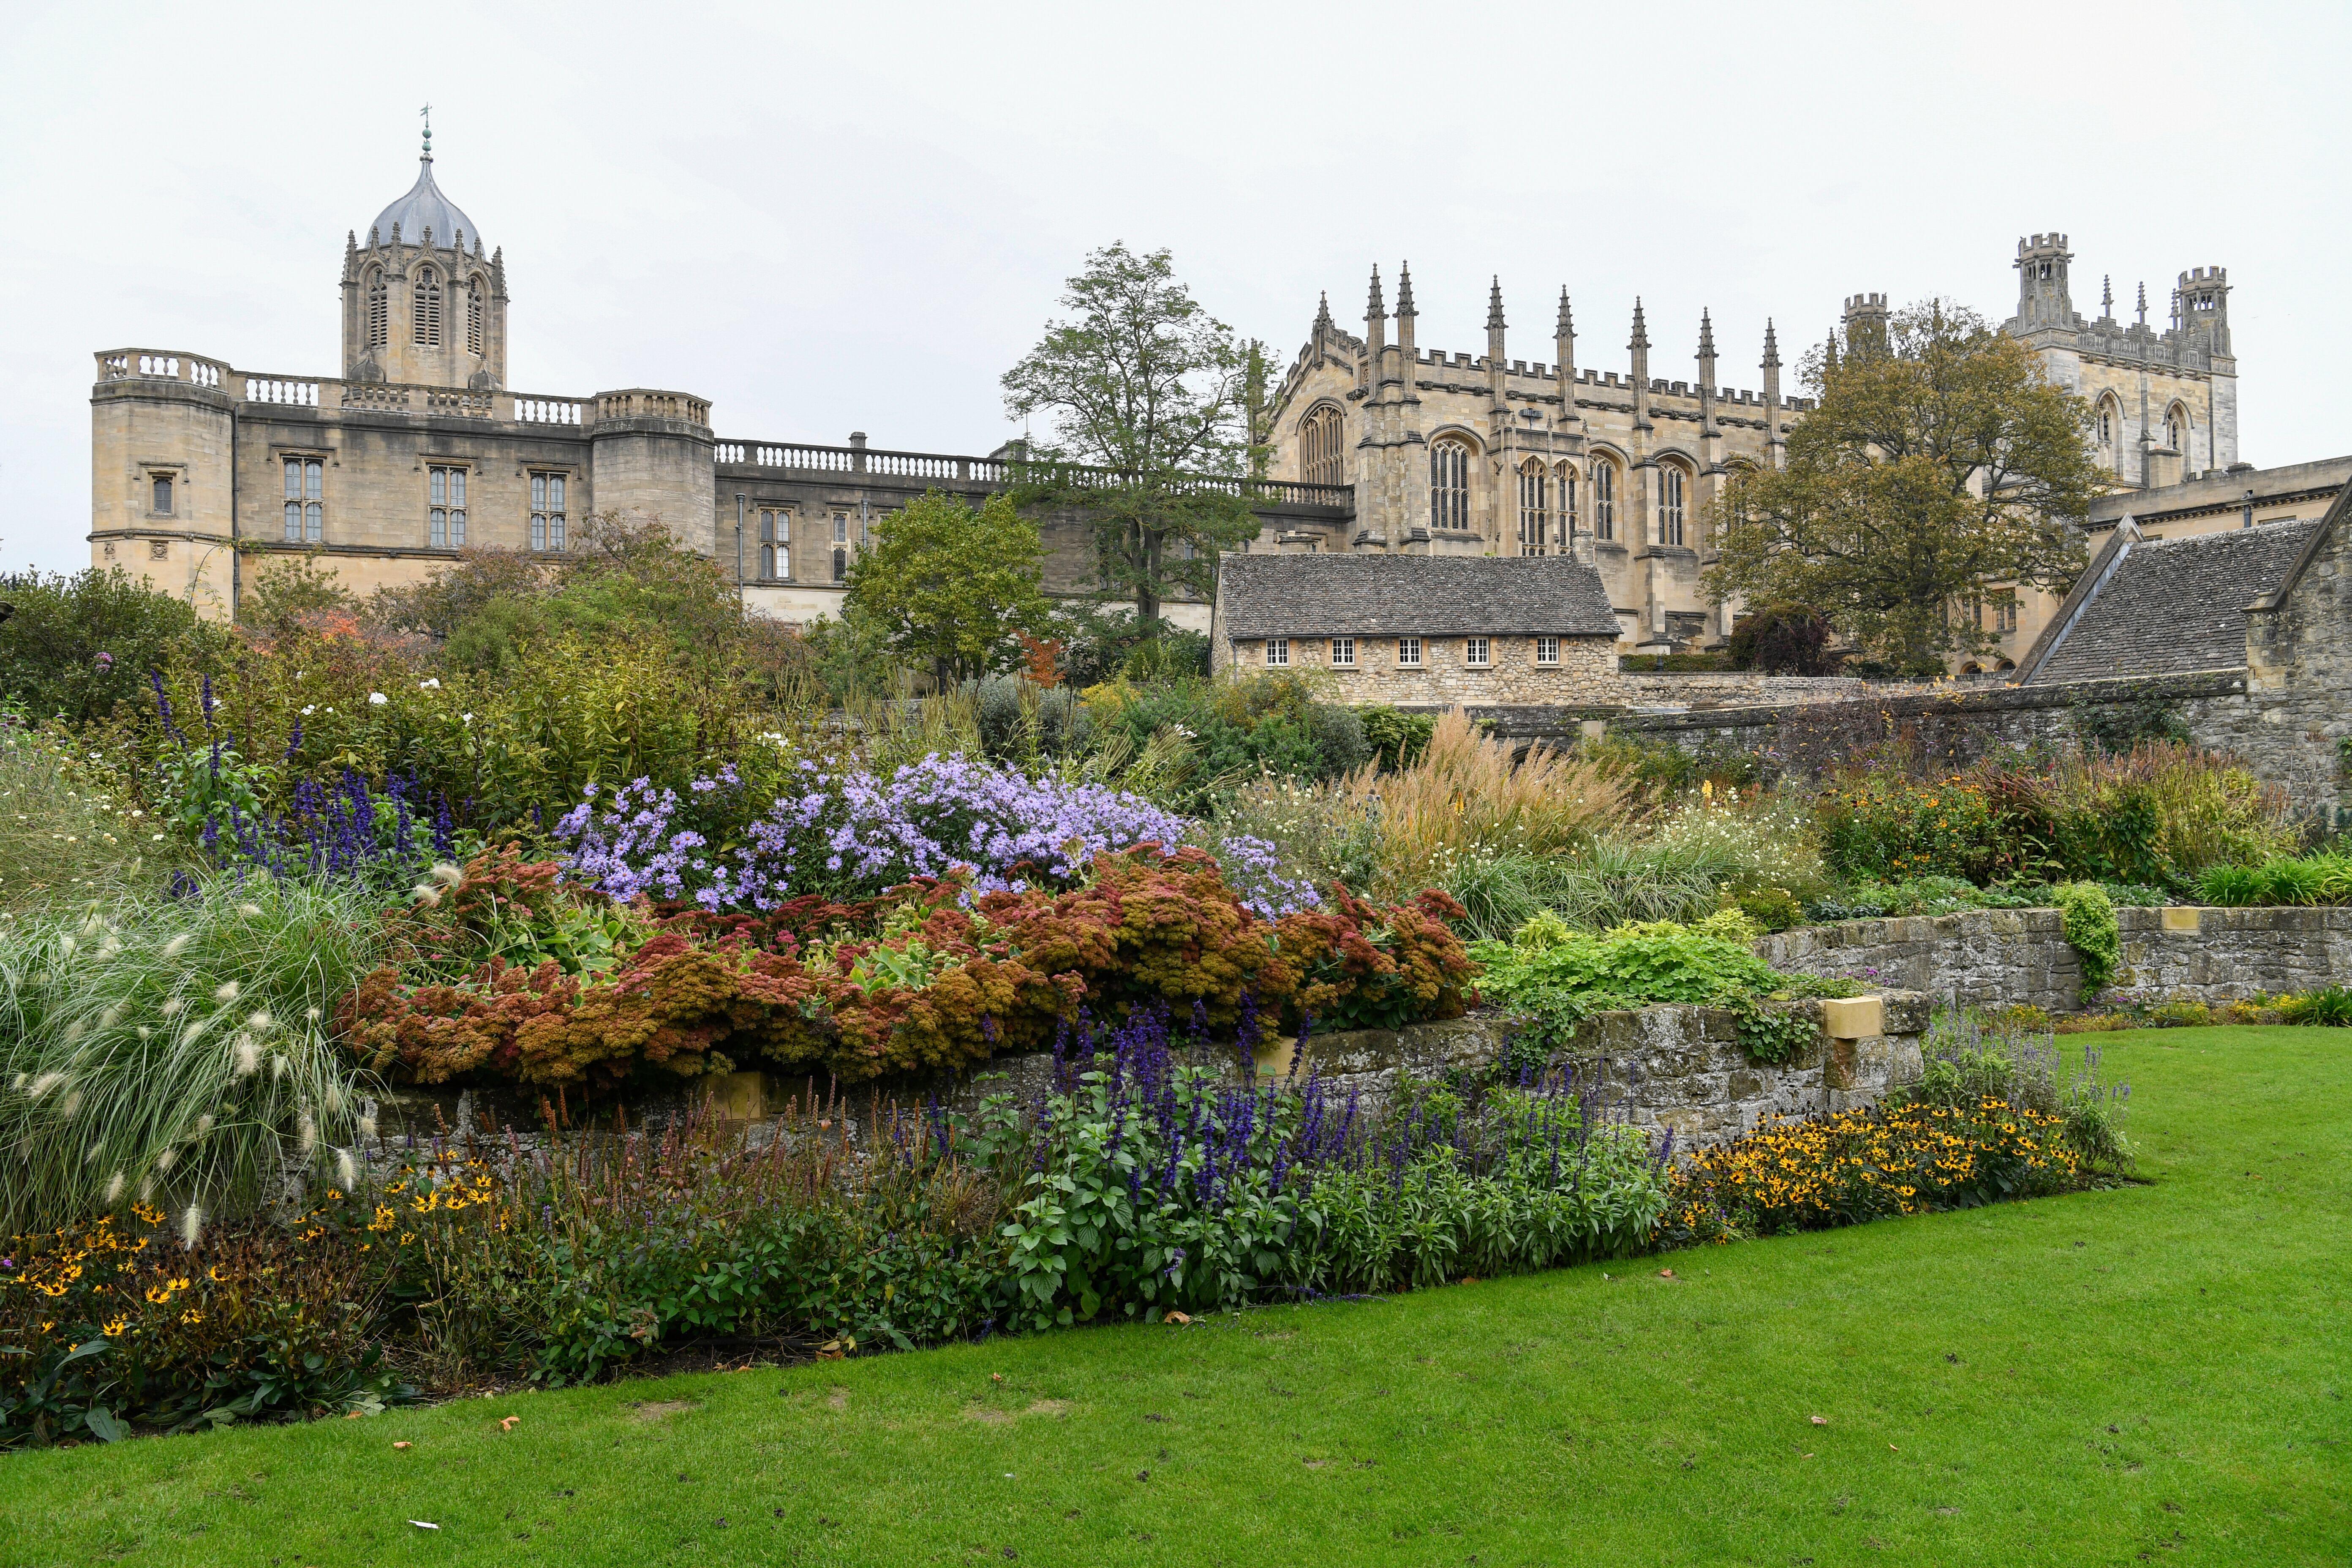 Os jardins fora da faculdade Christ Church na Universidade de Oxford. Élder Quentin L. Cook, do Quórum dos Doze Apóstolos, visita a Universidade de Oxford em Oxford, Inglaterra, no dia 23 de outubro, 2019.